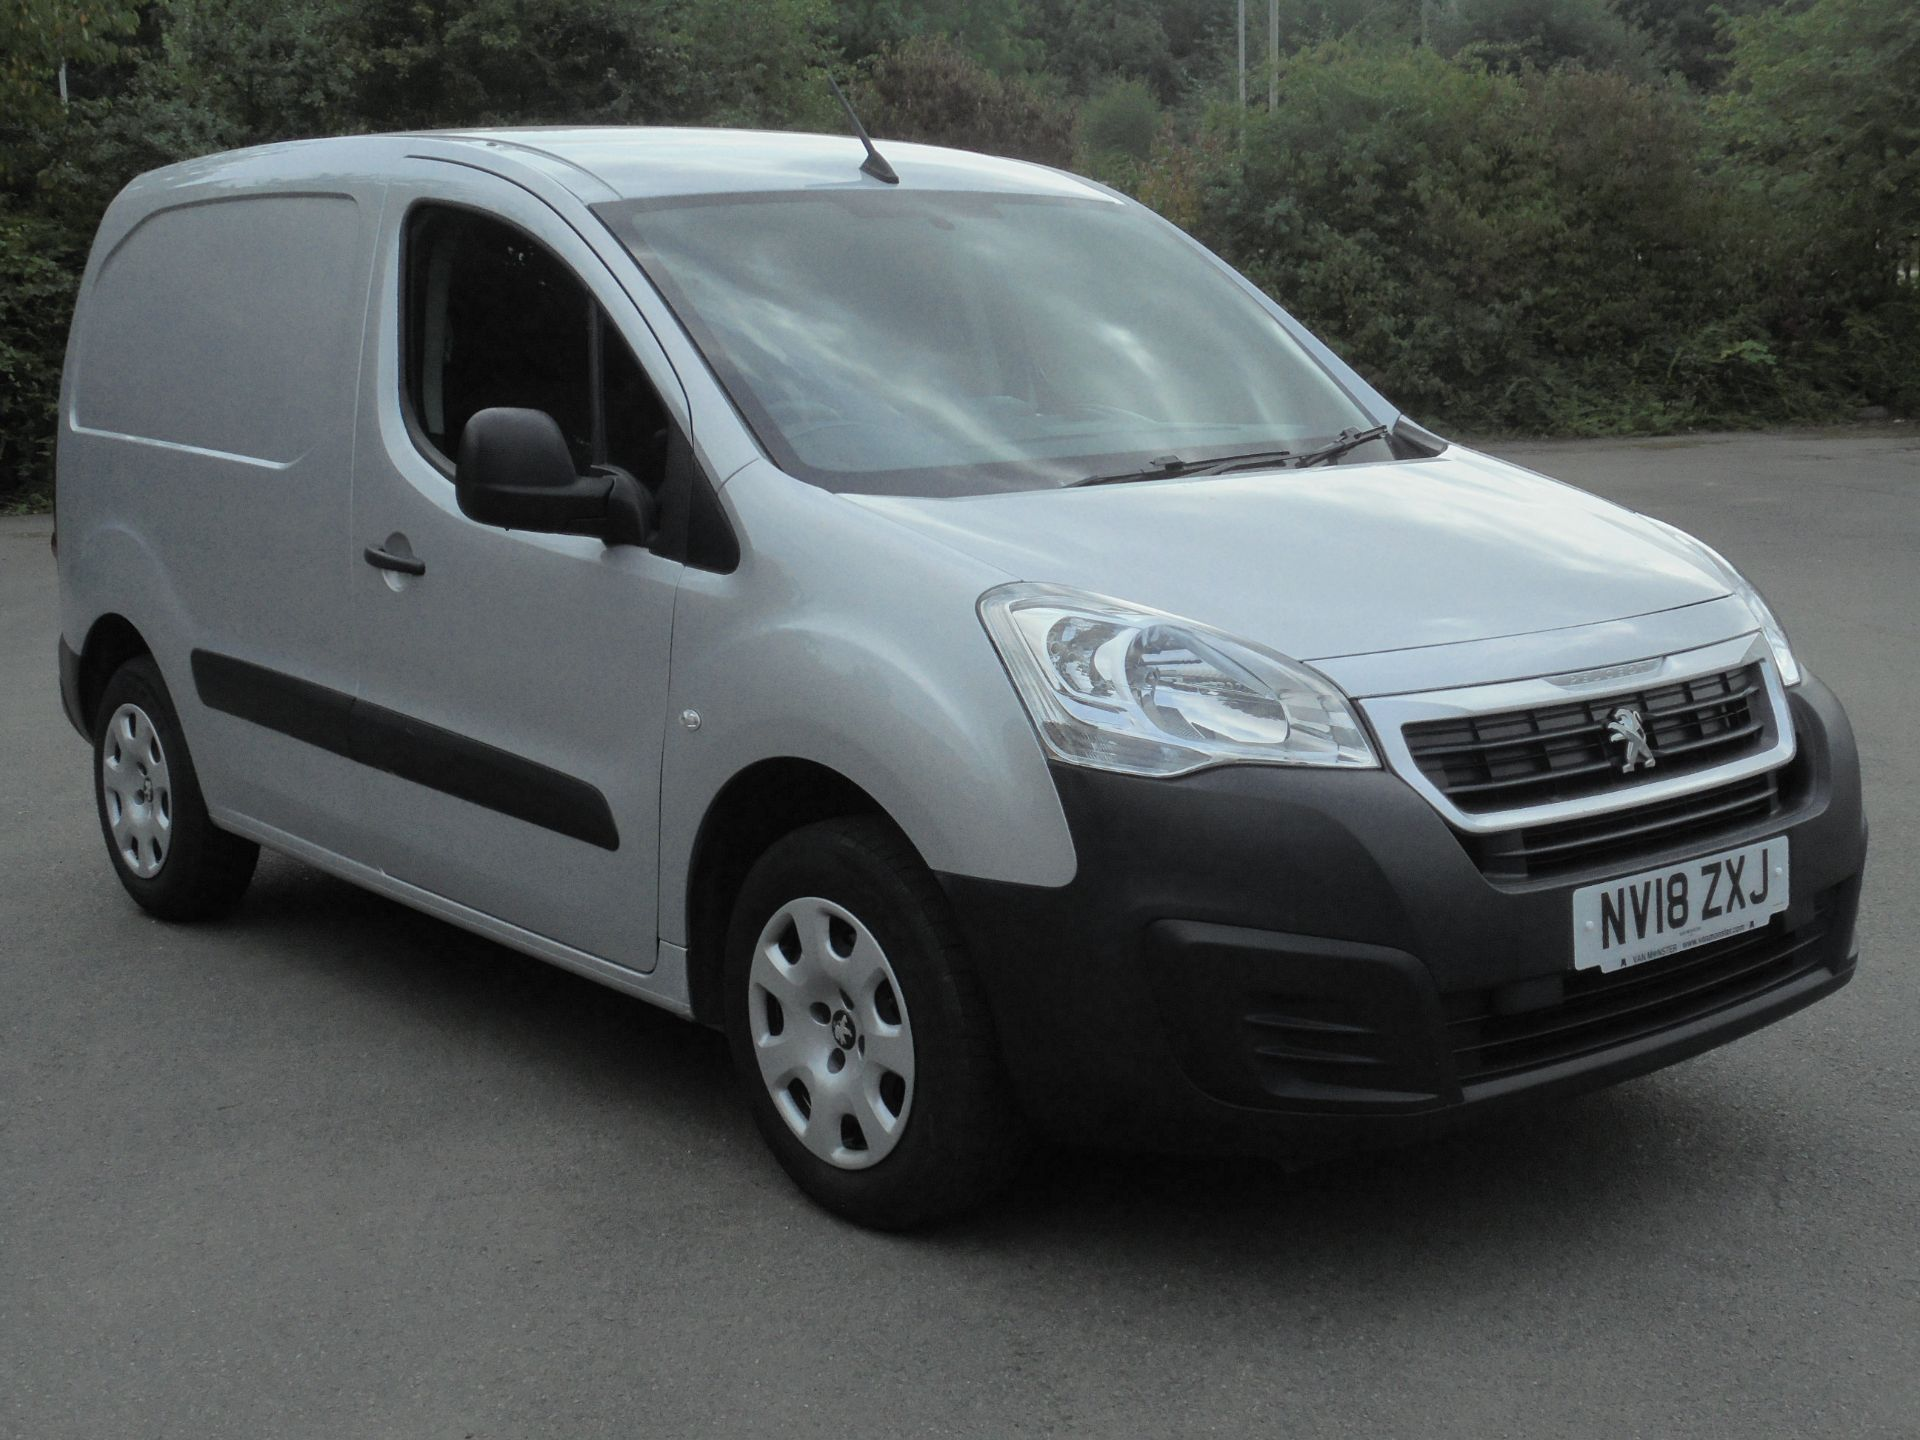 2018 Peugeot Partner 850 1.6 Bluehdi 100 Professional Van (NV18ZXJ)